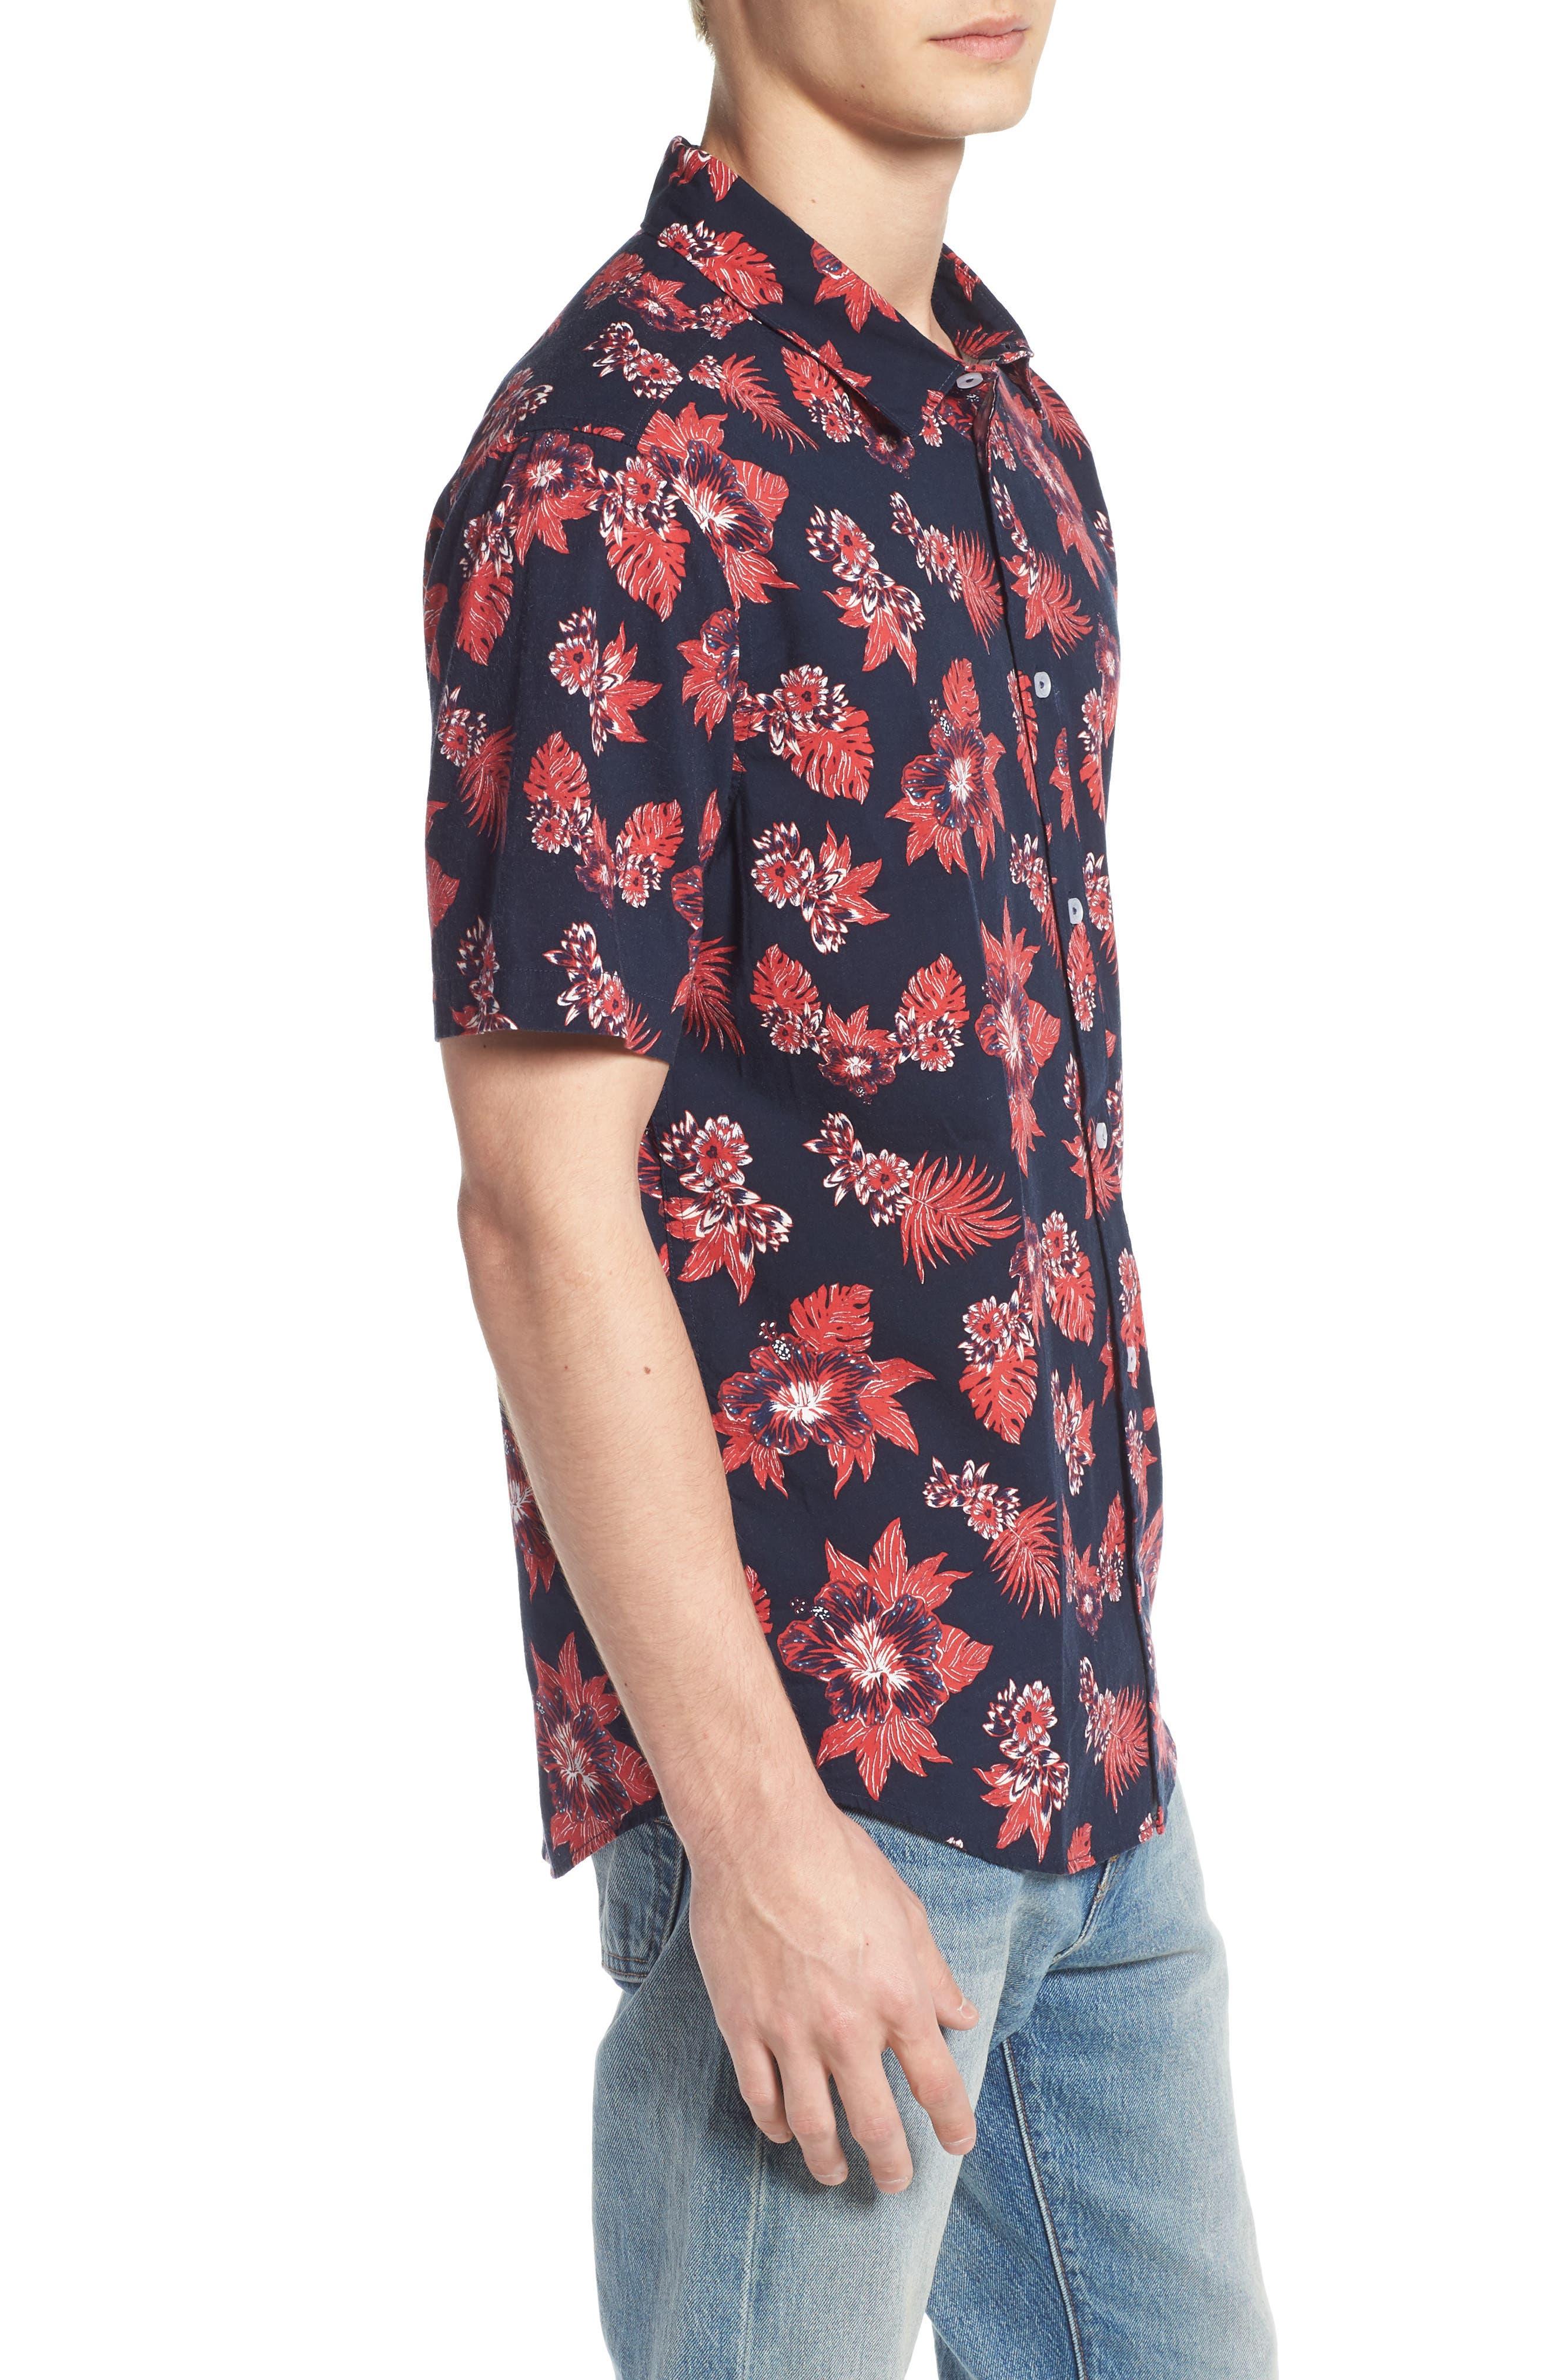 McMillian Woven Shirt,                             Alternate thumbnail 3, color,                             402